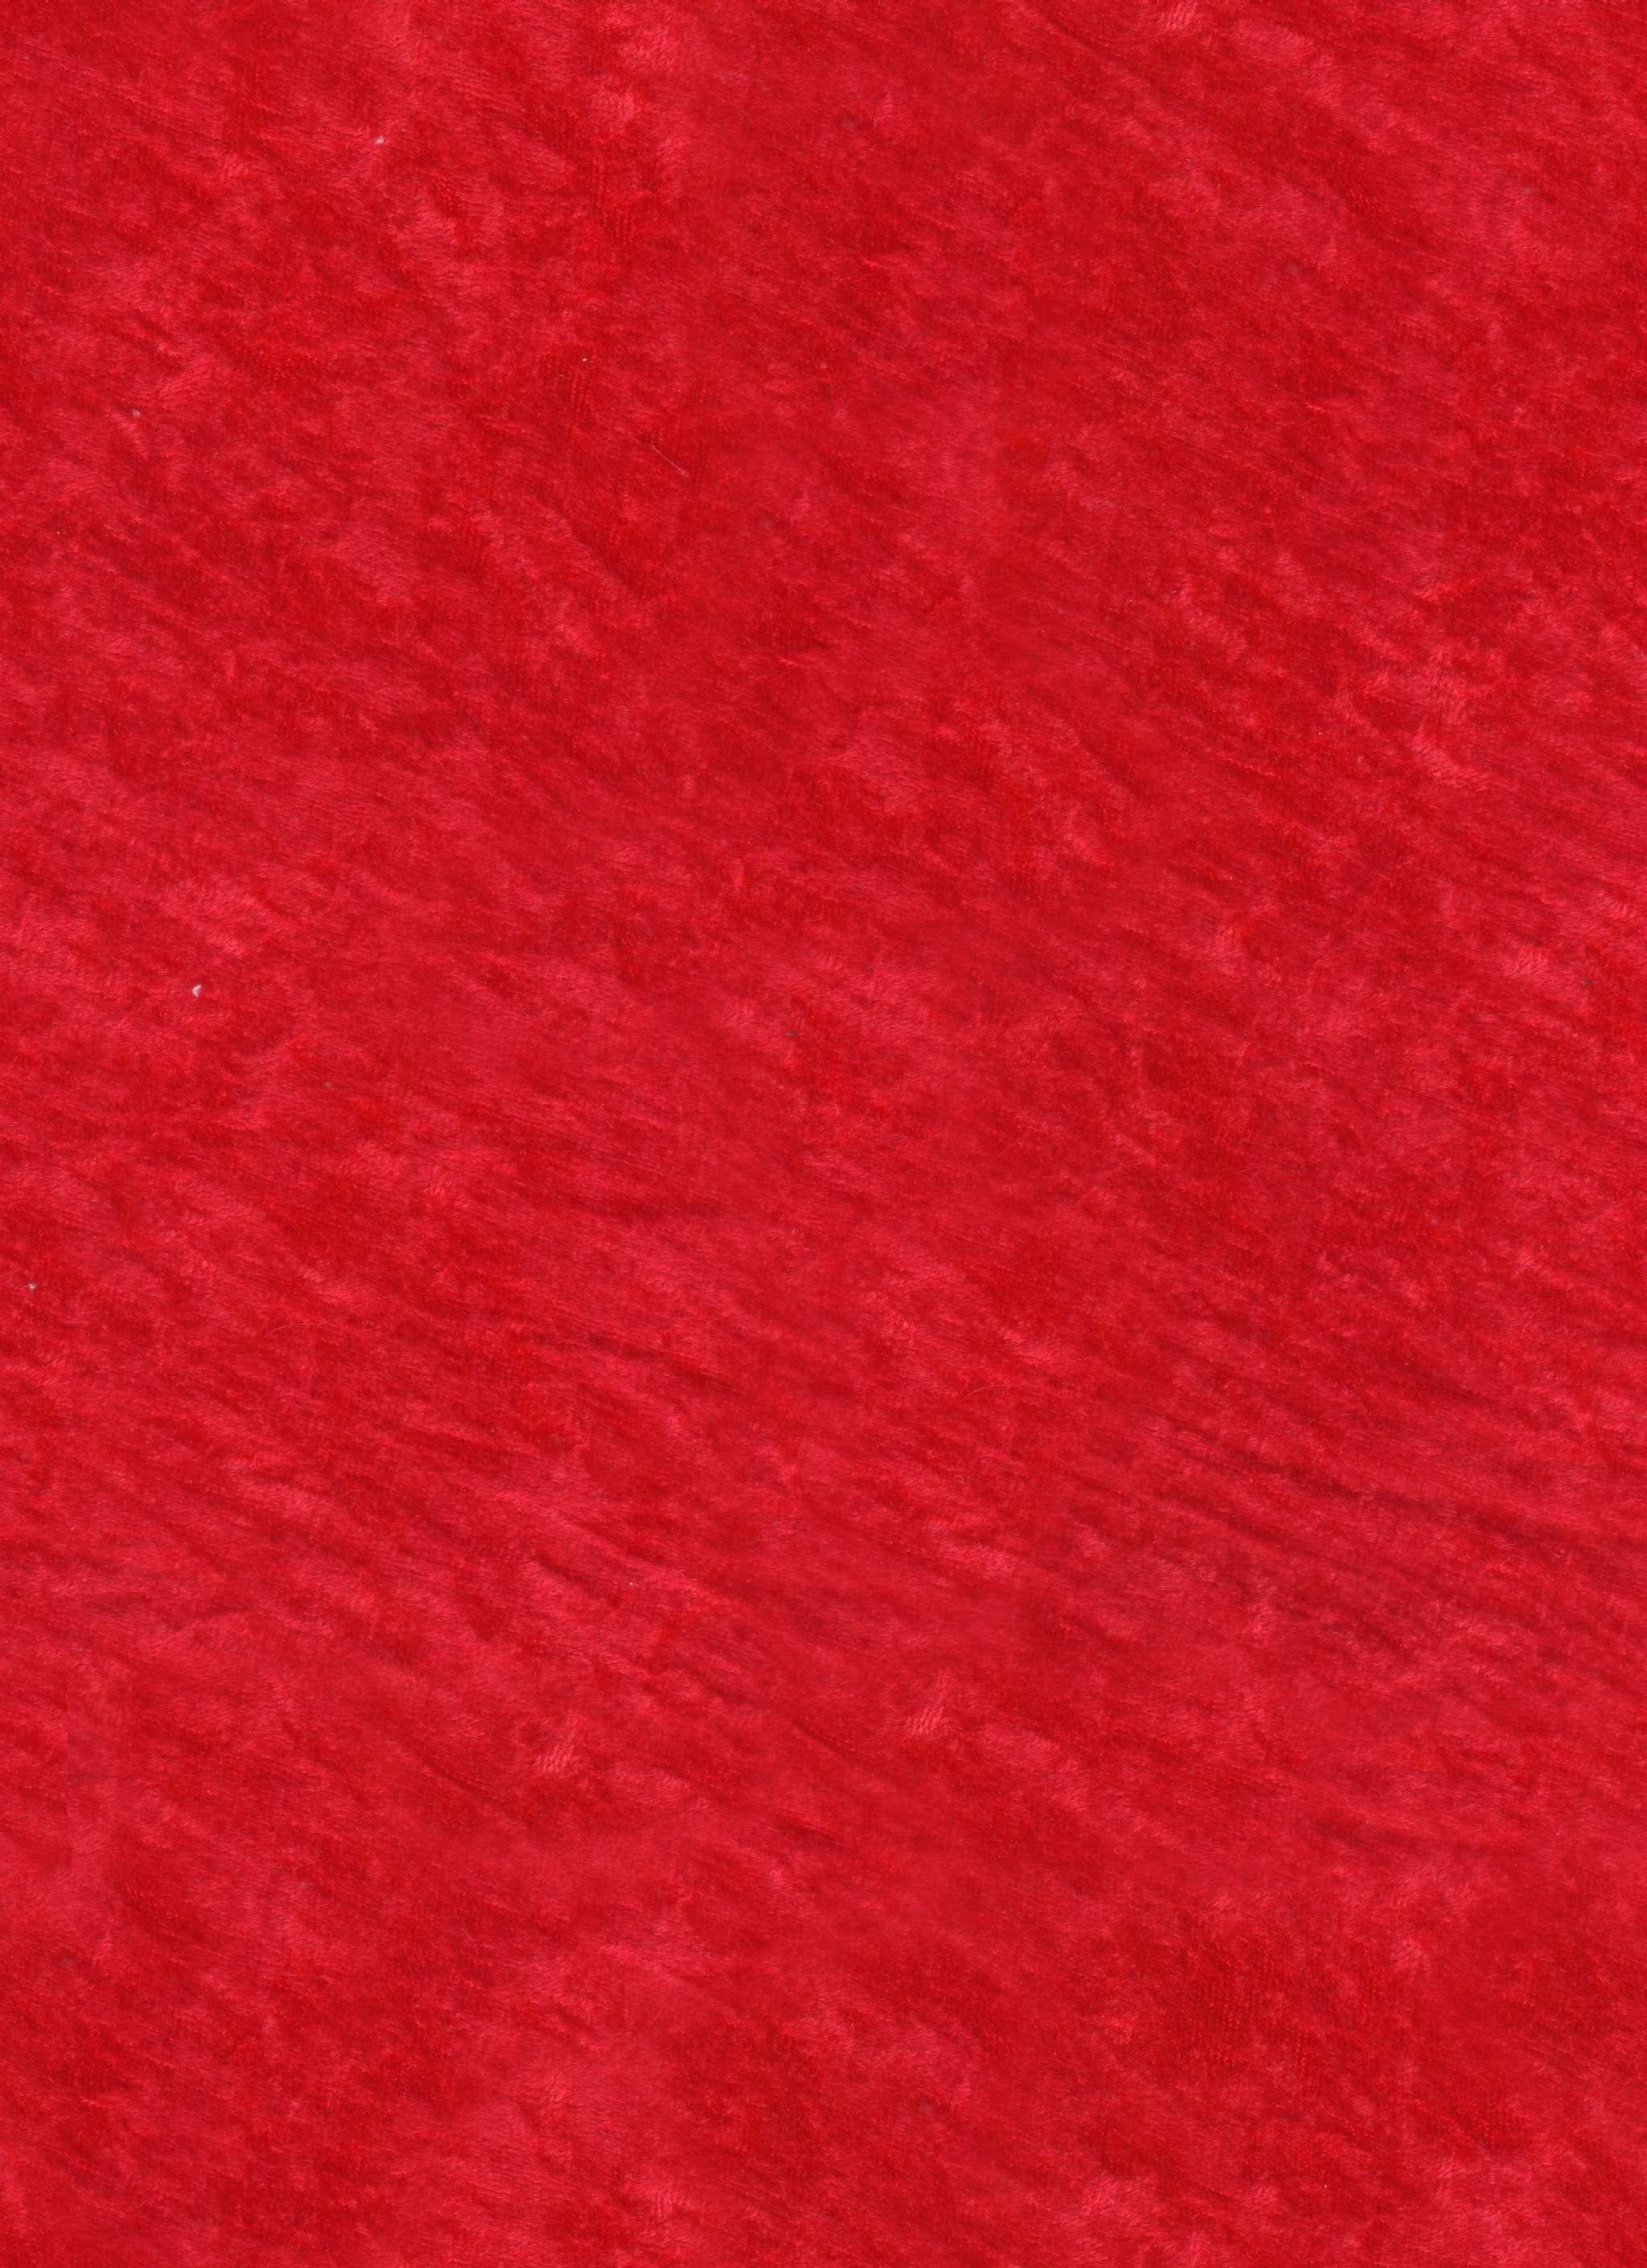 Human Fall Flat Wallpaper Free Photo Red Velvet Texture Backdrop Stock Soft